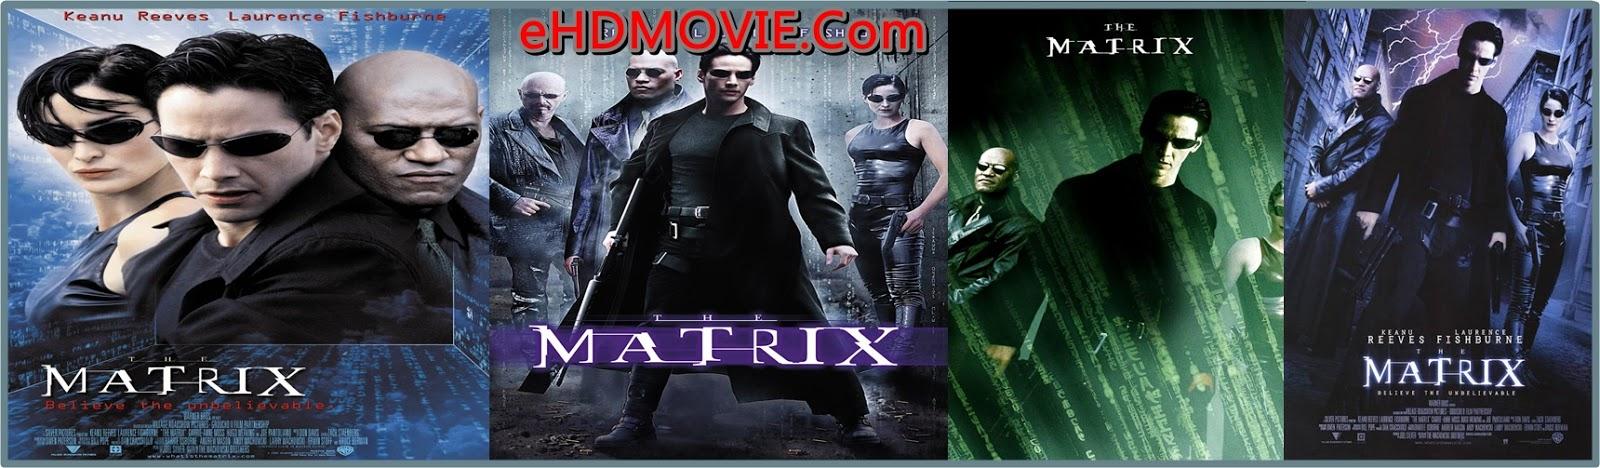 The Matrix 1999 Full Movie Dual Audio [Hindi – English] 720p - 480p ORG BRRip 450MB - 1.2GB ESubs Free Download